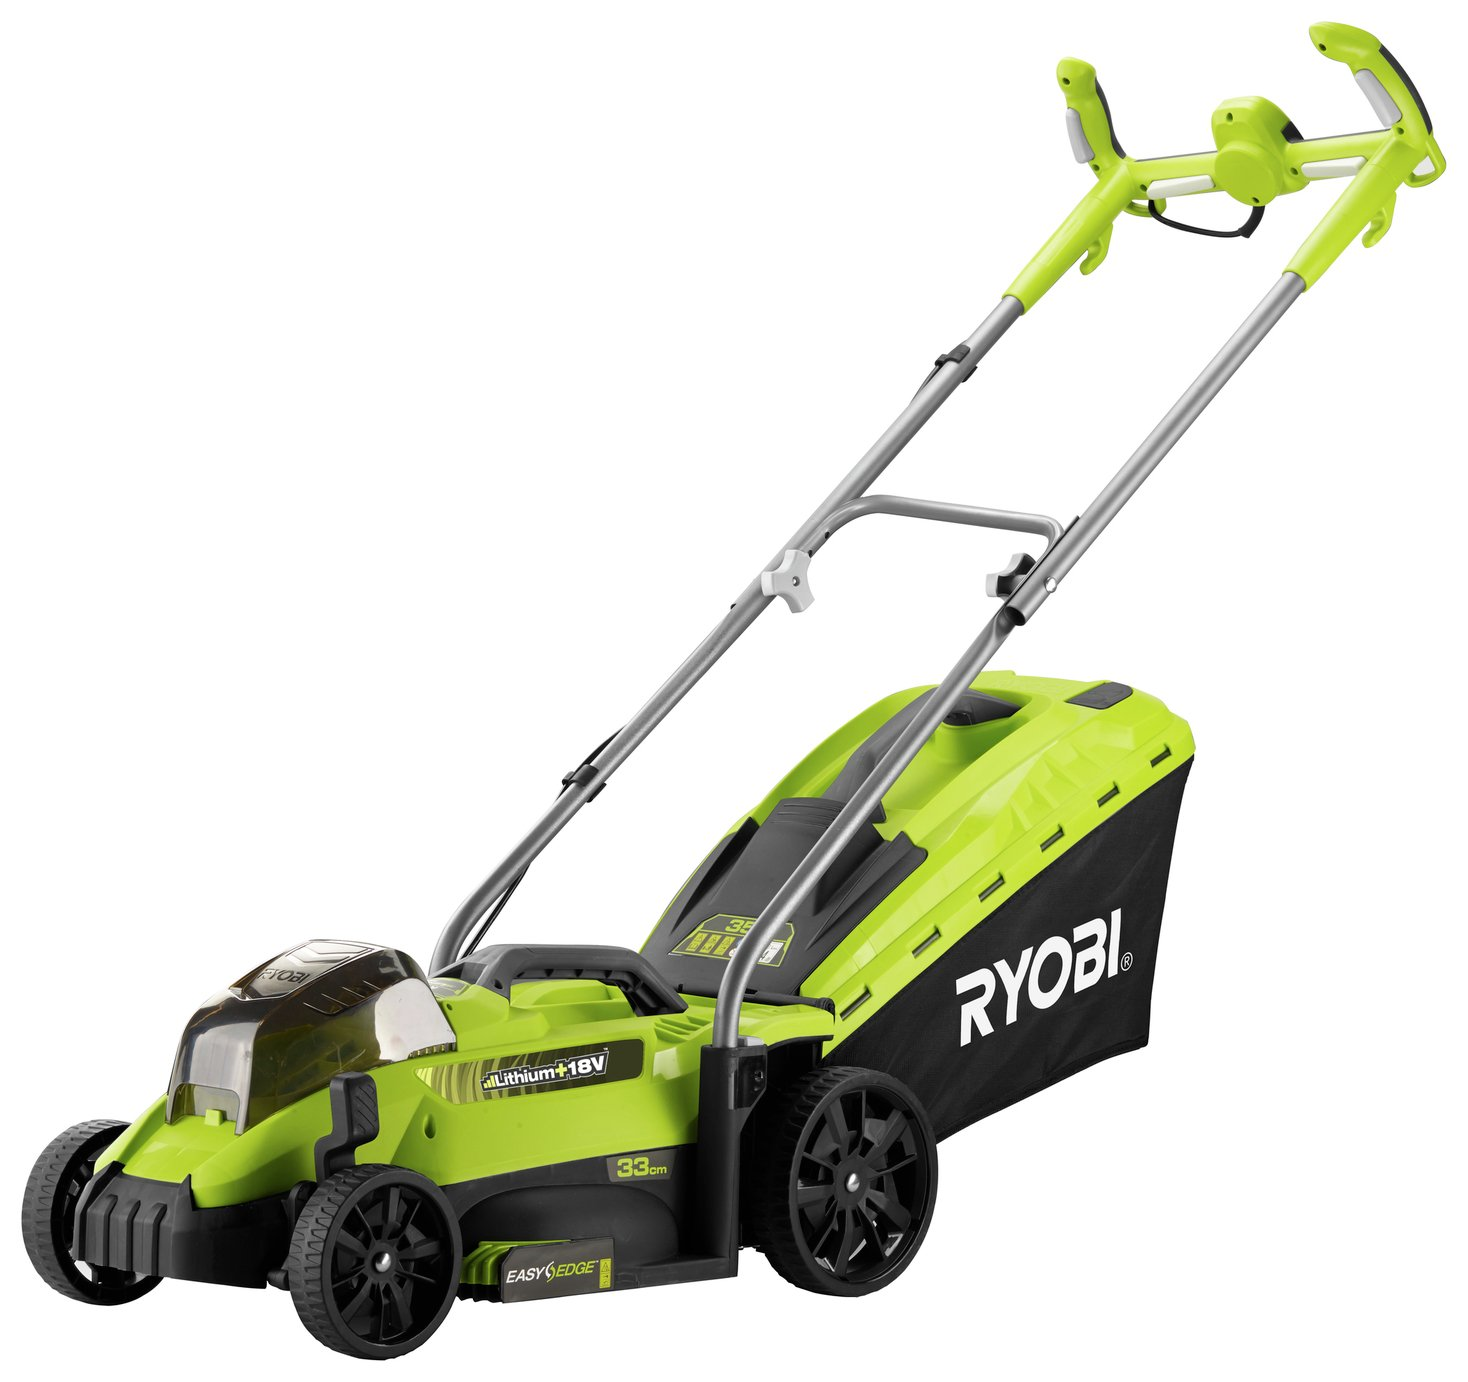 Ryobi OLM1833H 33cm Cordless Bare Rotary Mower - No Battery at Argos